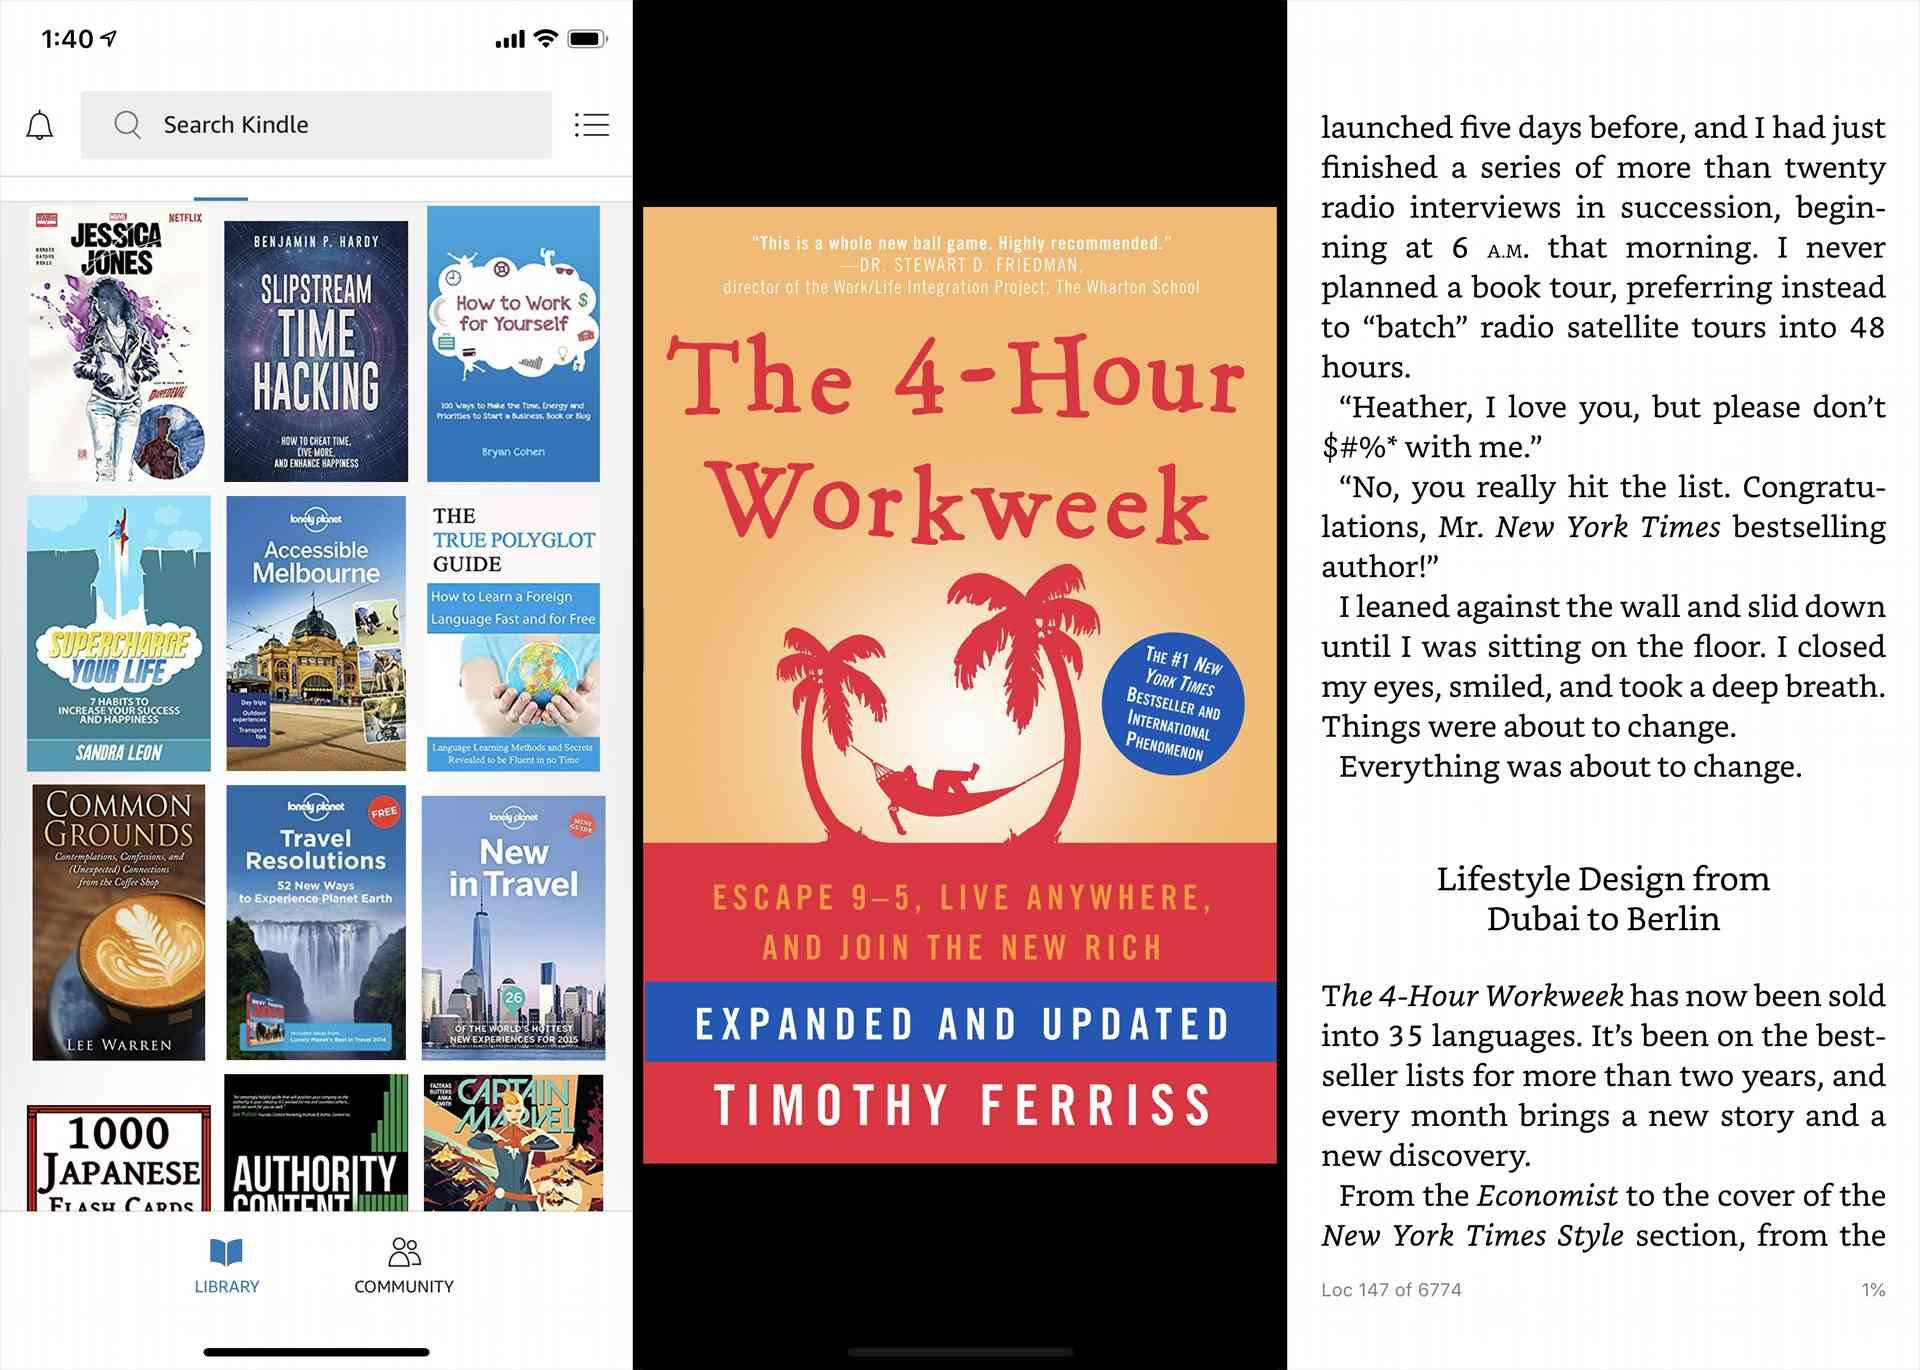 Amazon Kindle app on an iPhone XS.